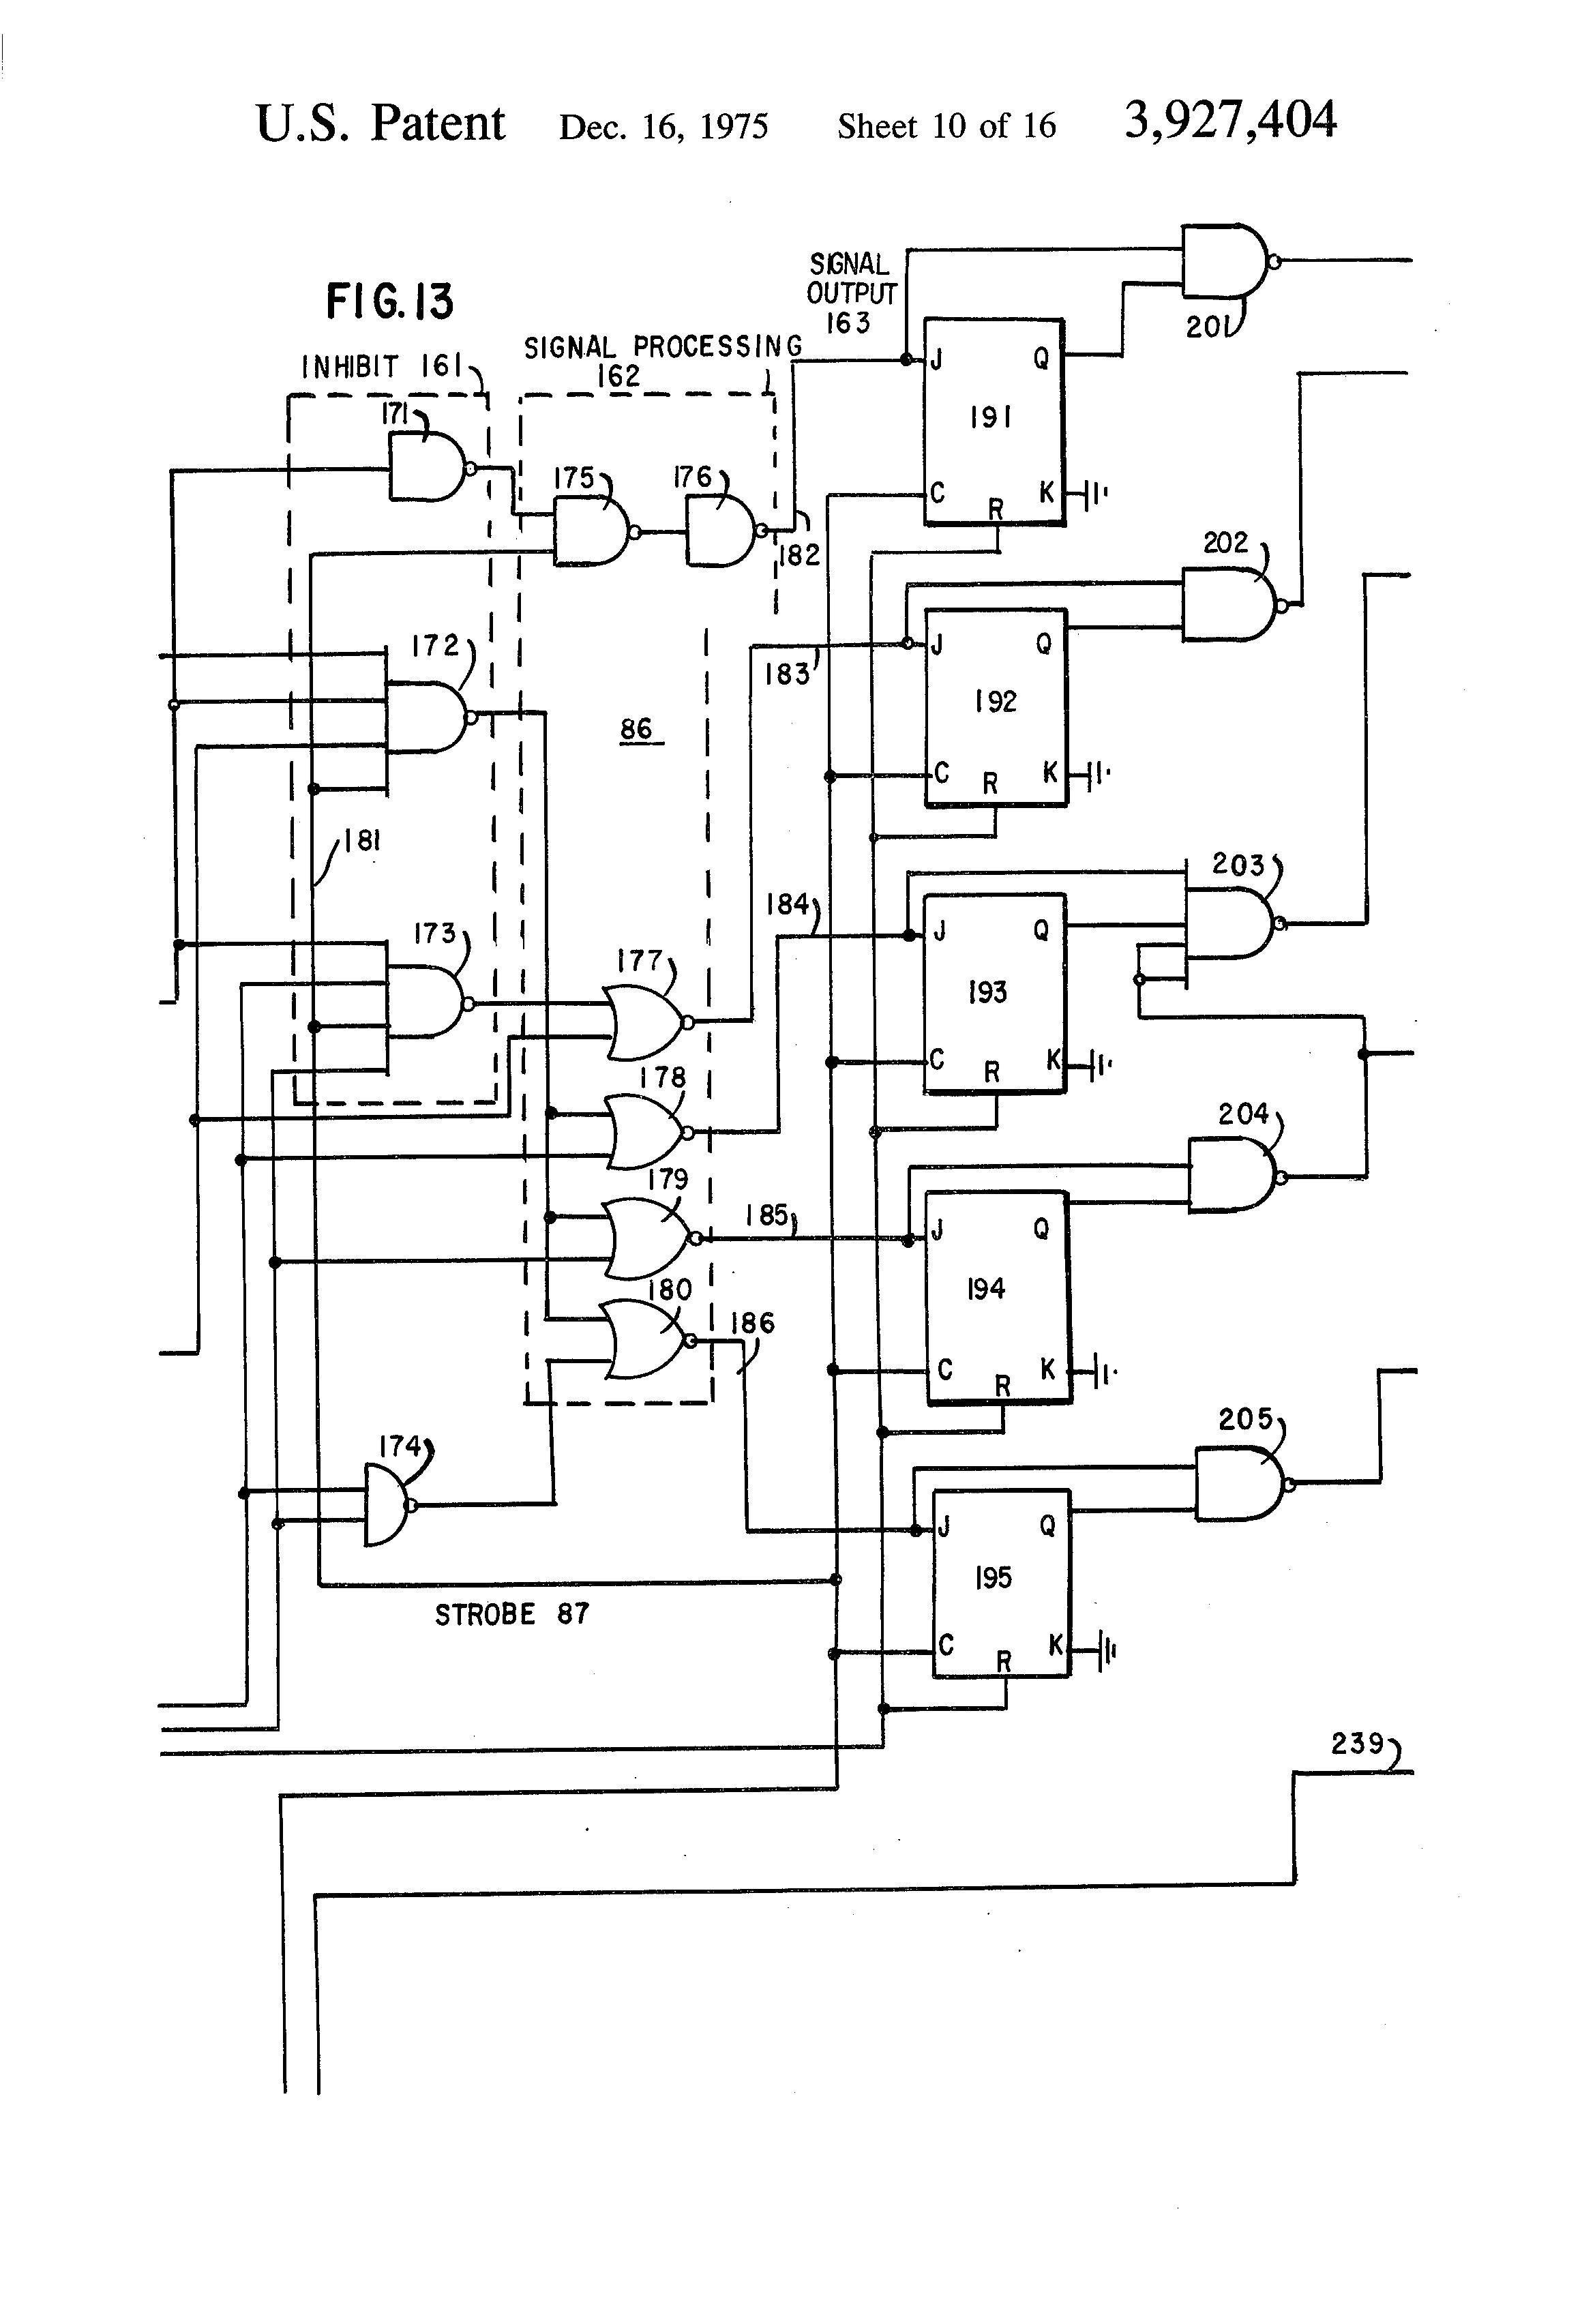 cl a fire alarm panel wiring diagram fire alarm circuit